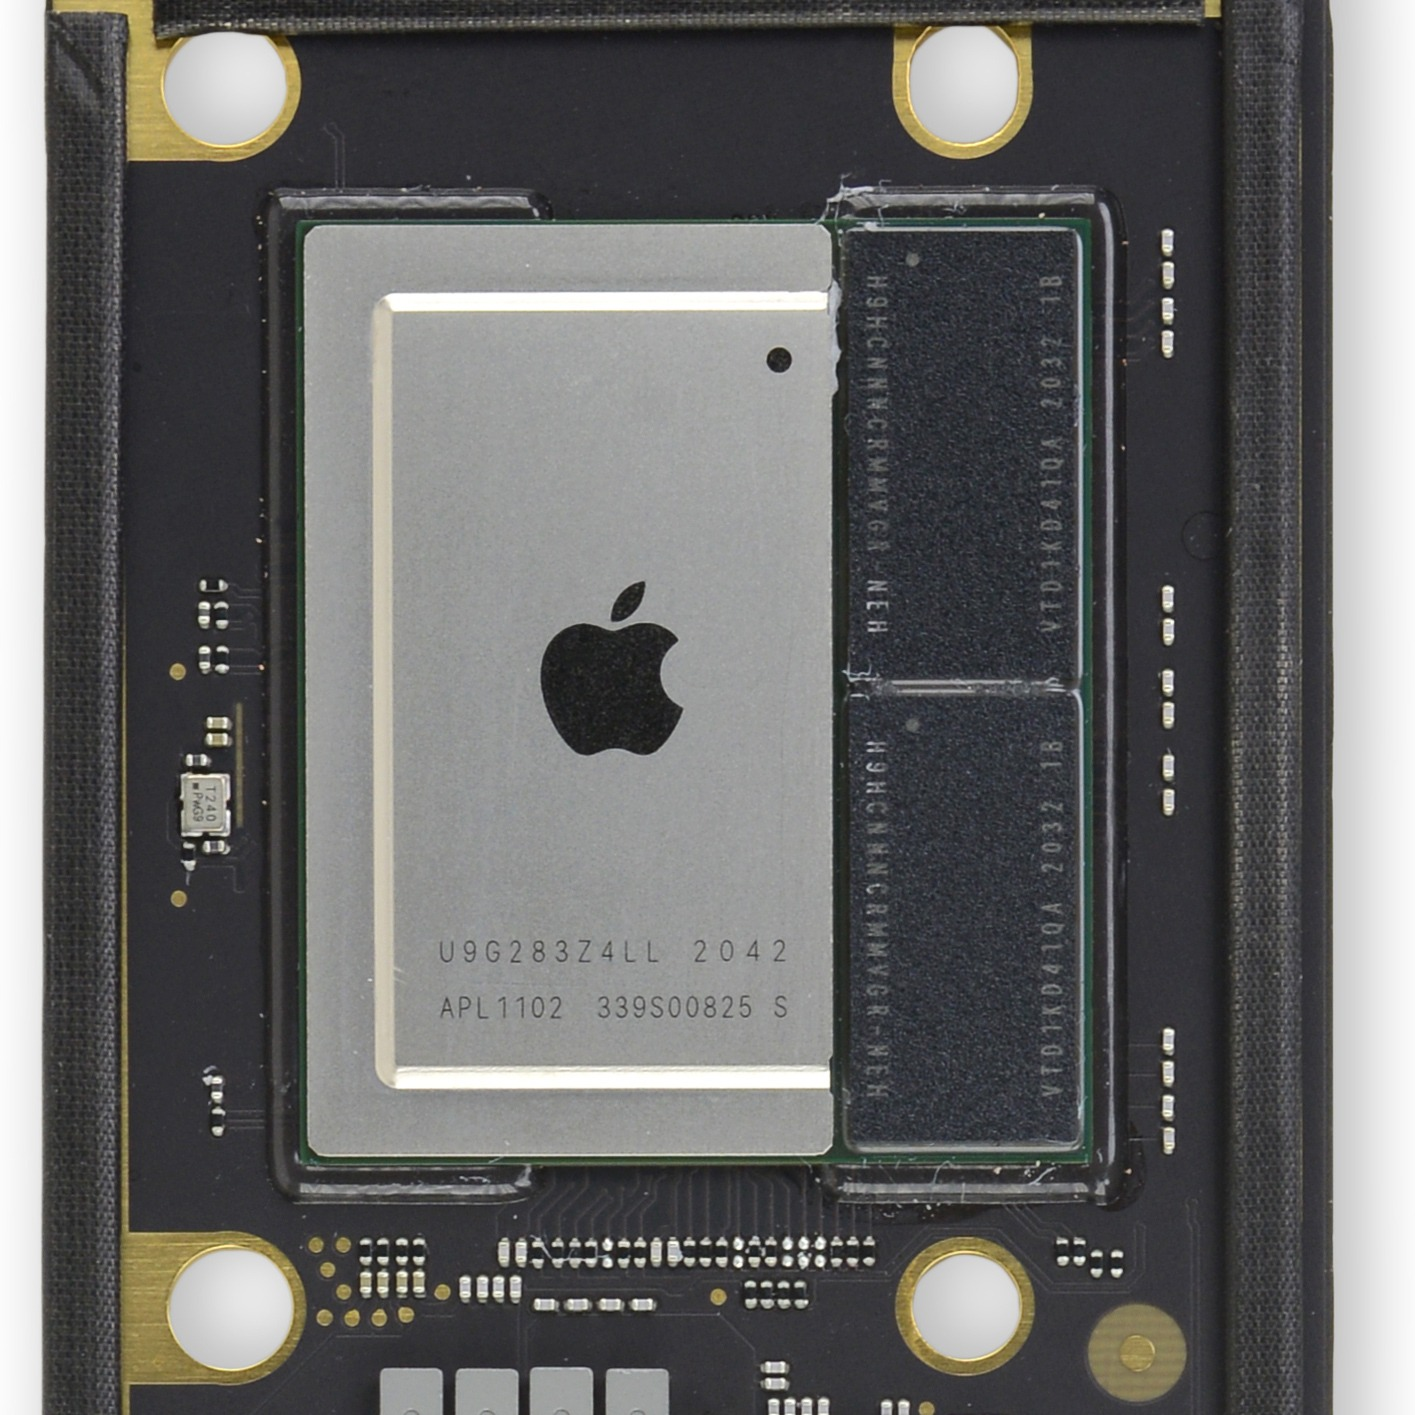 CPU, GPU Y RAM M1 de Apple